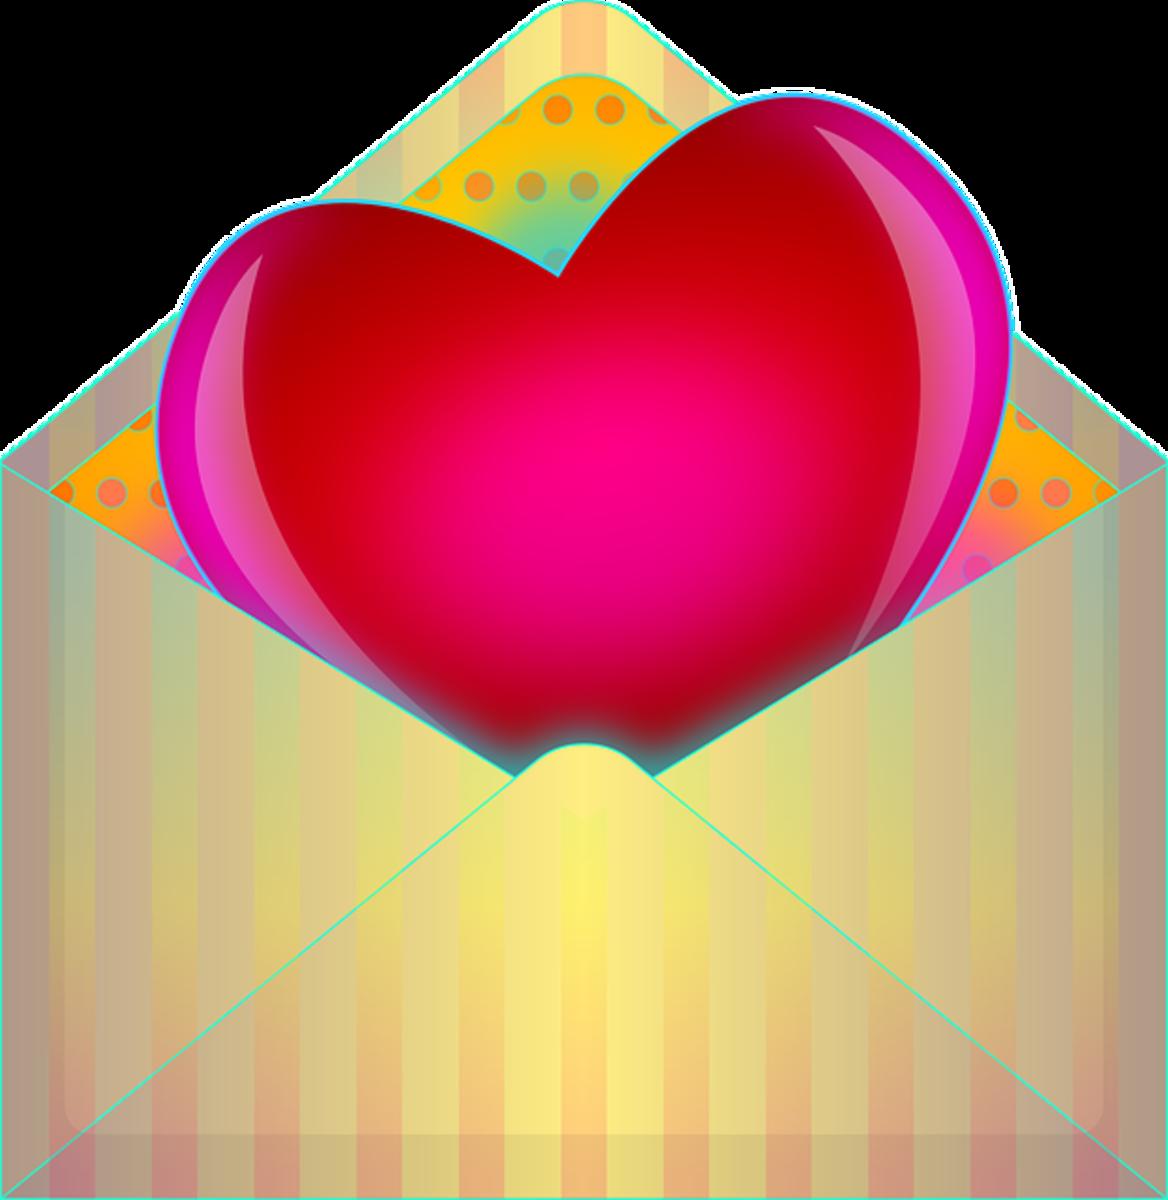 Valentine in Envelope